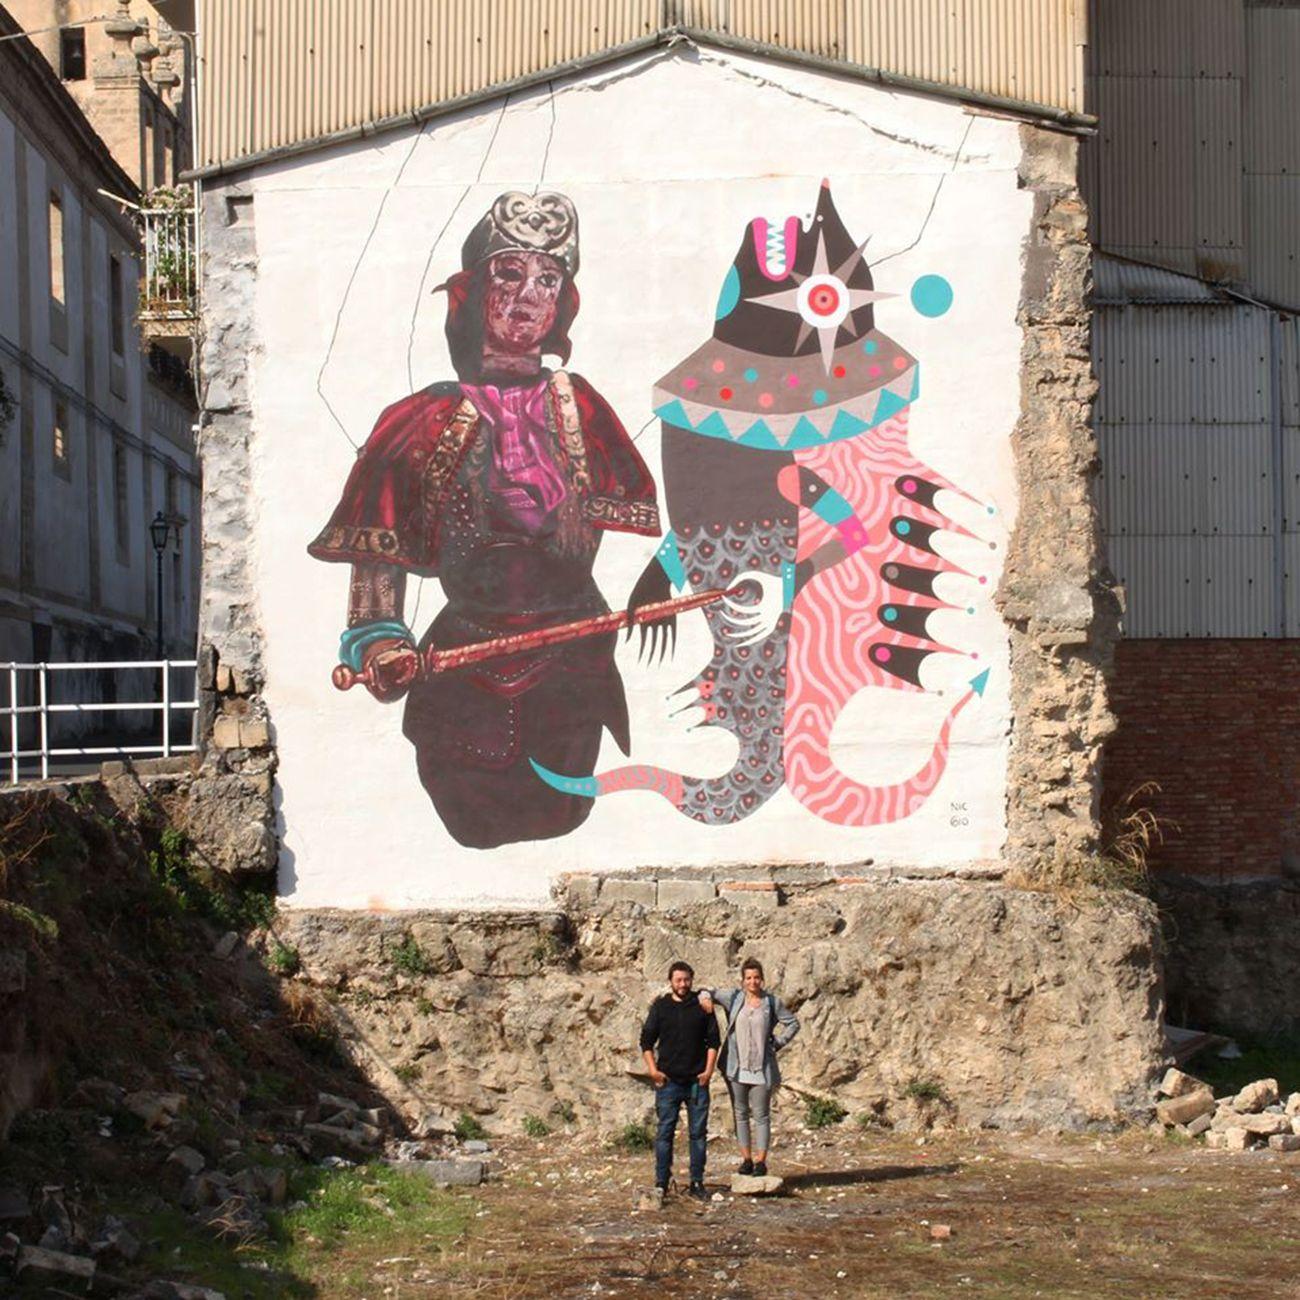 Gio Pistone e Nicola Alessandrini, Ruggero e l'Orca, via S.Francesco d'Assisi – quartiere Badia, Lentini 2017, photo Stefania Urrata